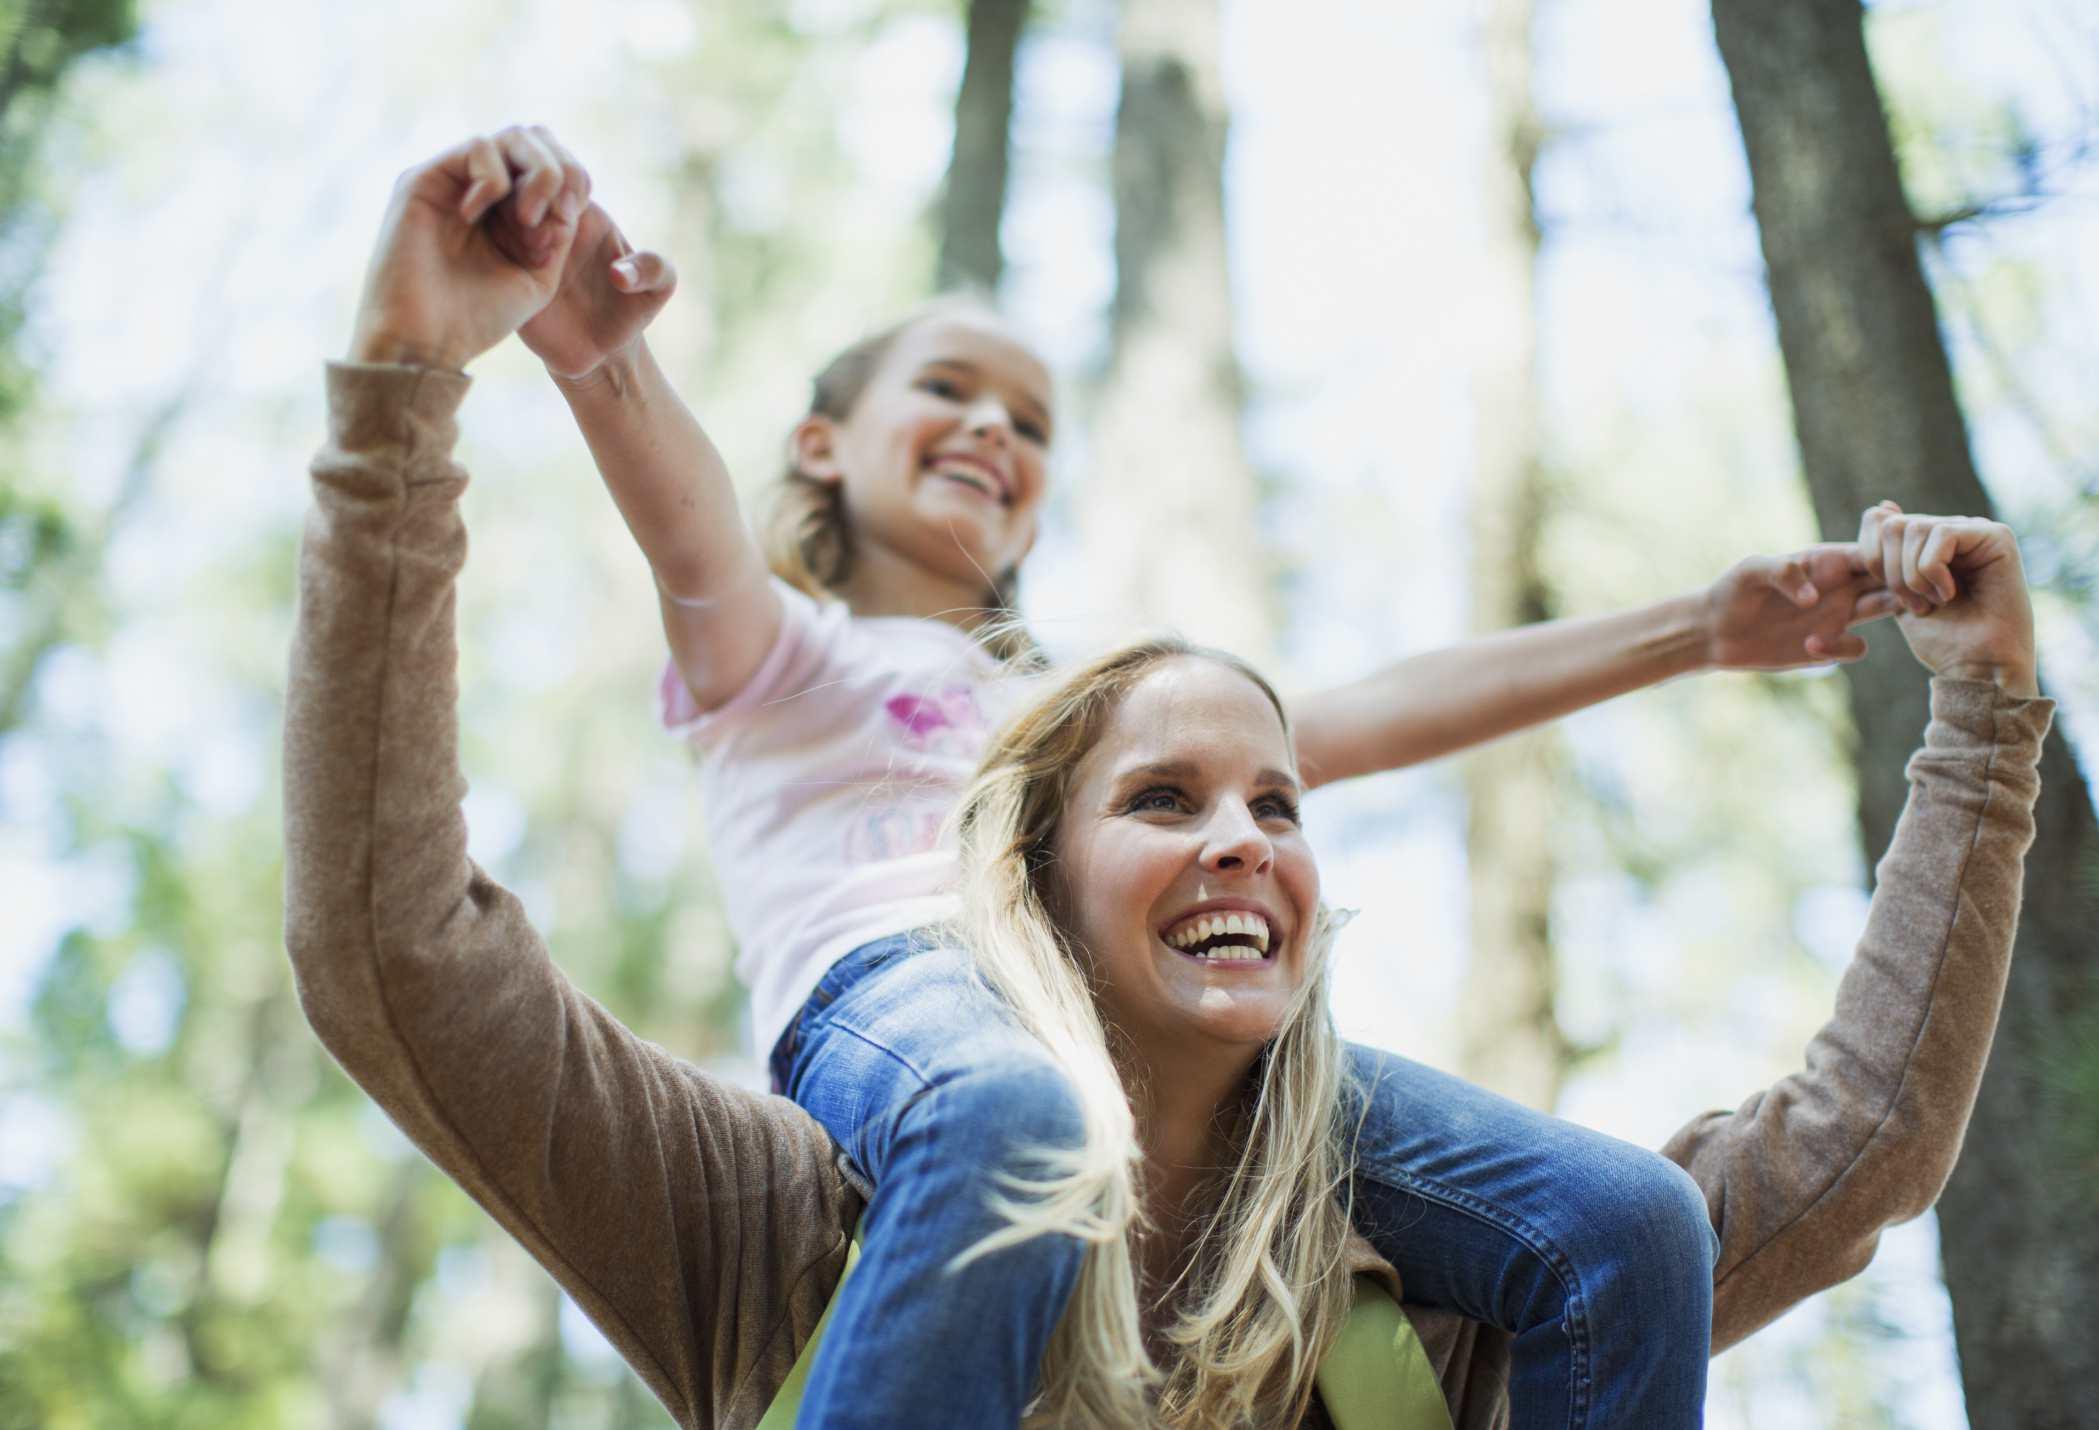 optimism-child-parent-happy-Caiaimage:Paul-Bradbury.jpg